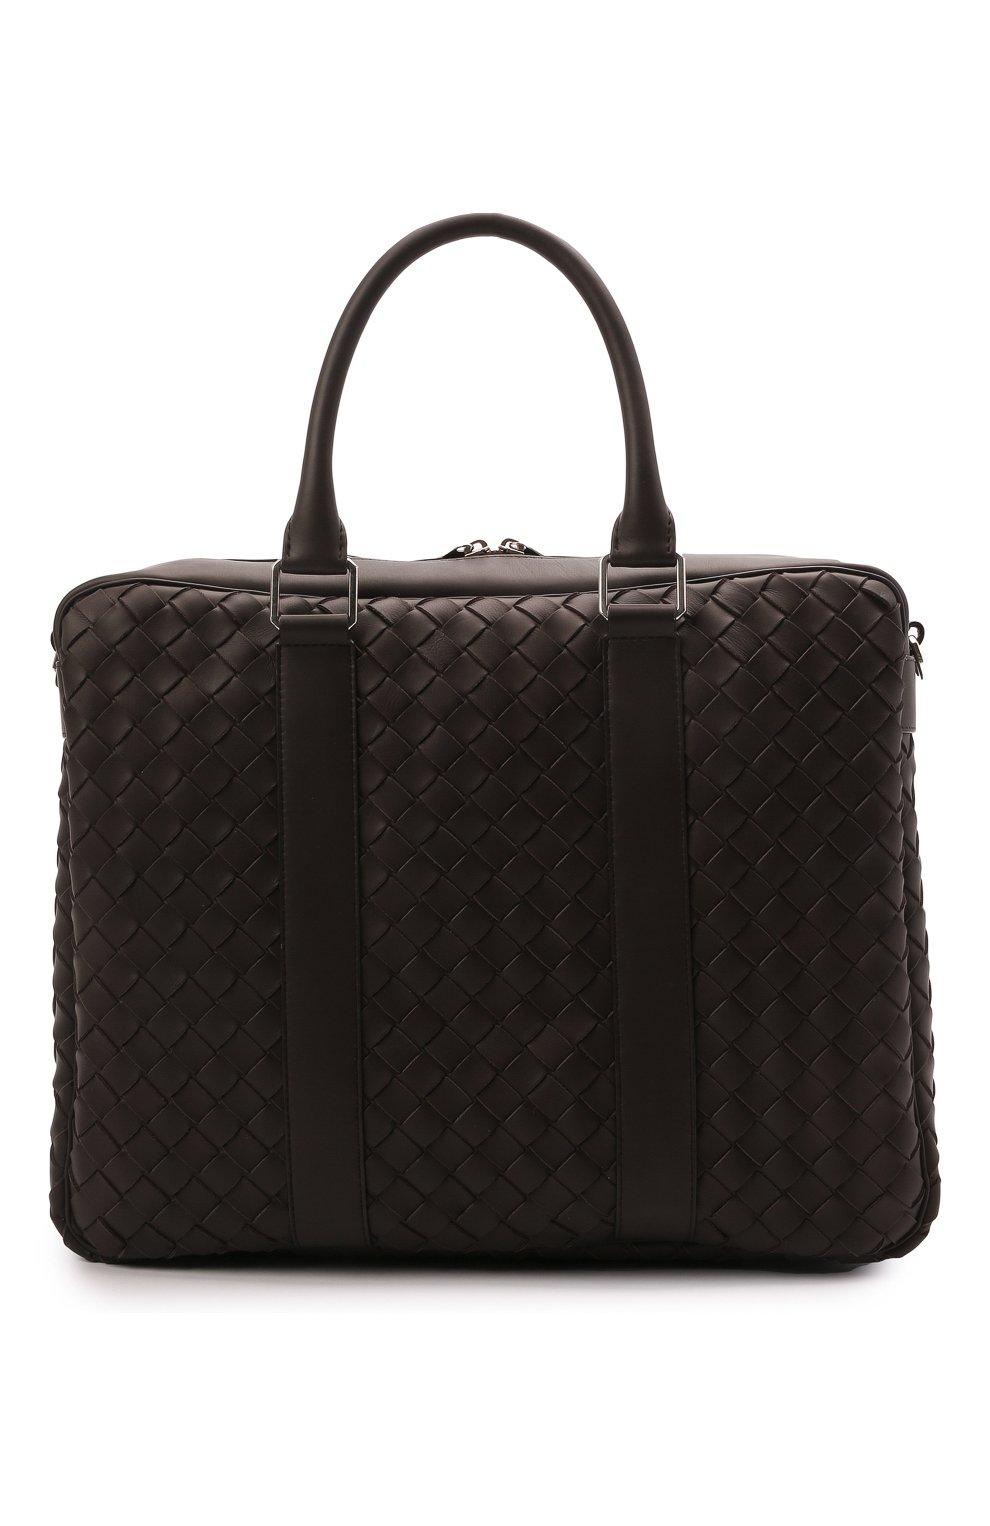 Мужская кожаная сумка для ноутбука BOTTEGA VENETA темно-коричневого цвета, арт. 650372/V0E51 | Фото 1